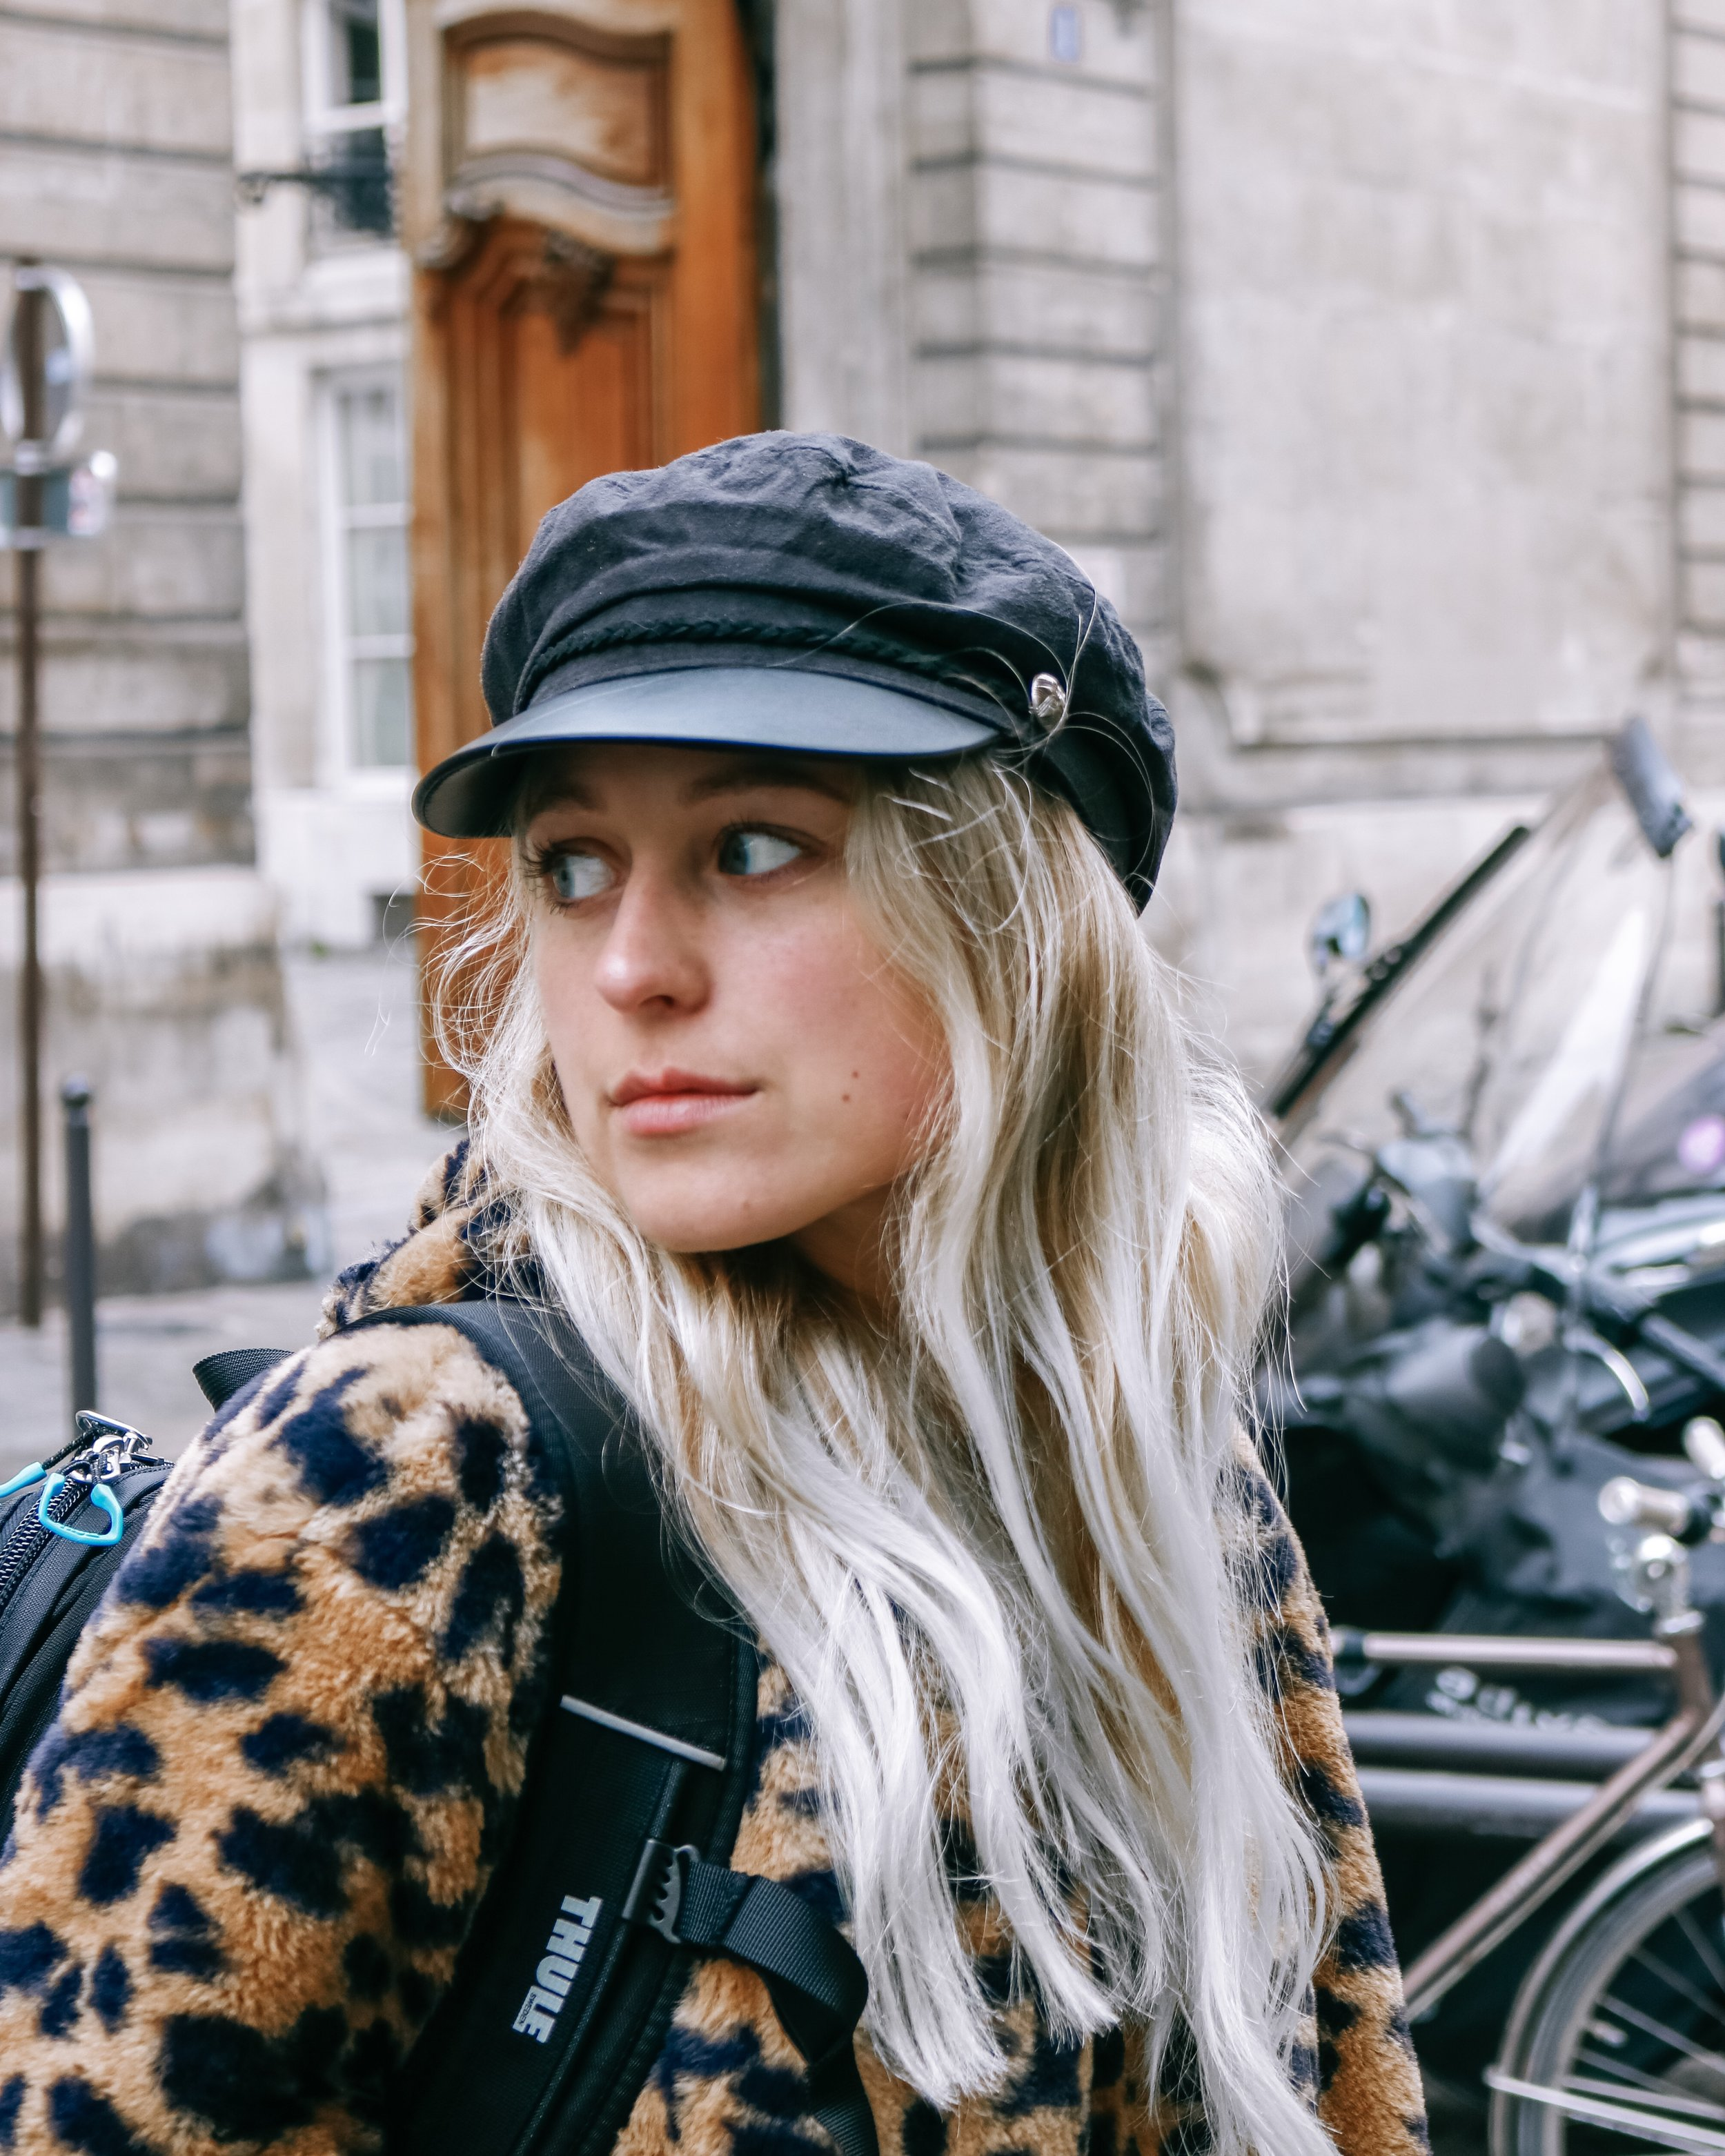 Kessler Ramirez – Paris, France streetstyle